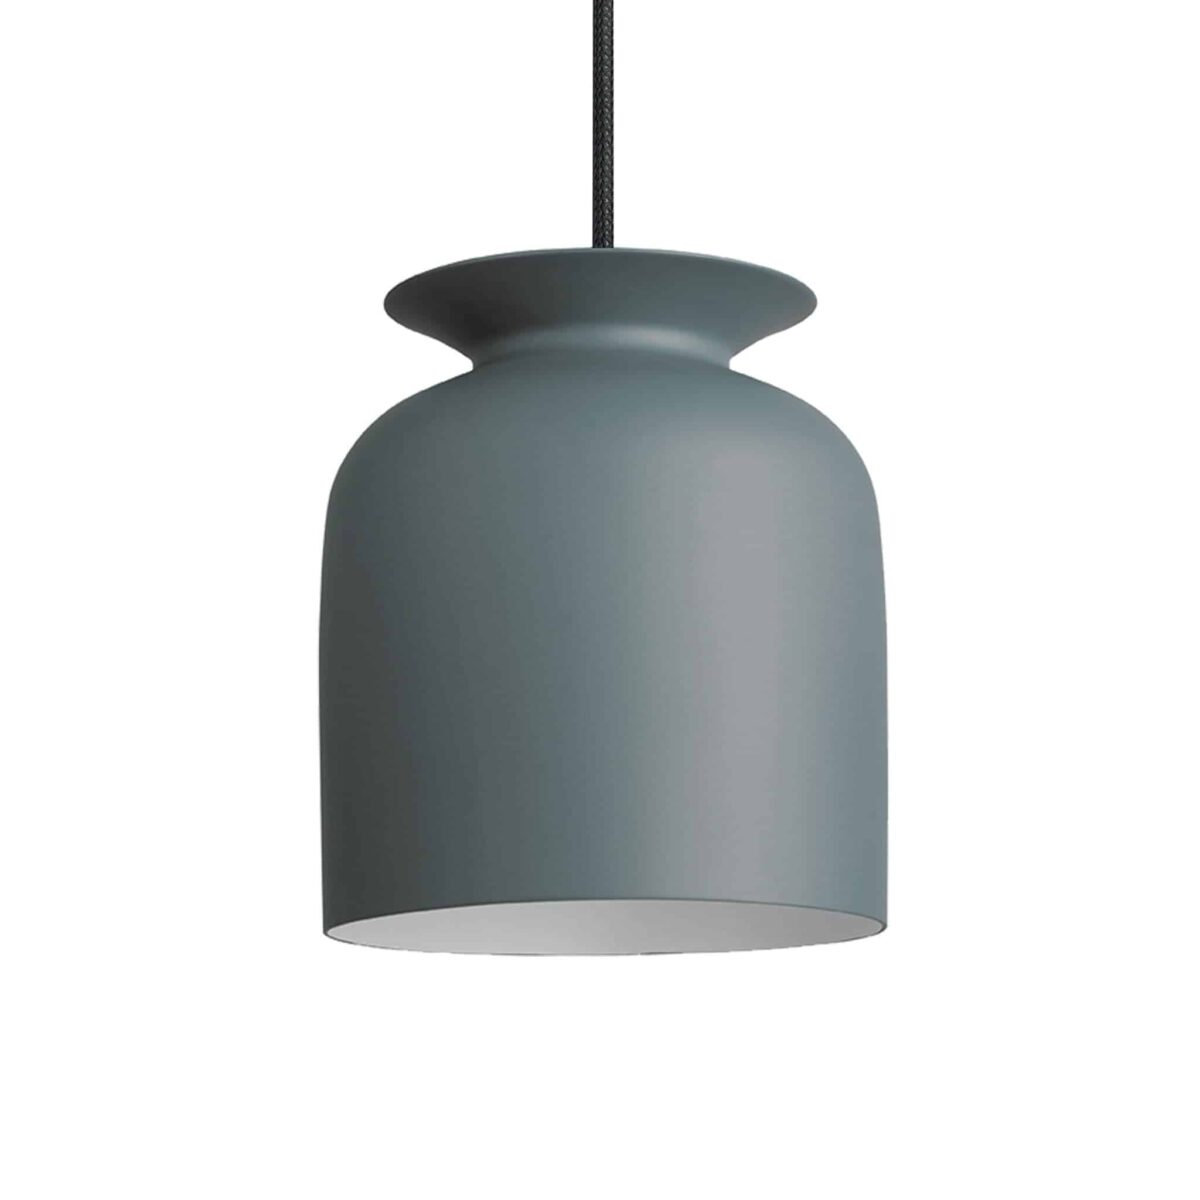 gubi-ronde-pendant-pigeon-grey-001